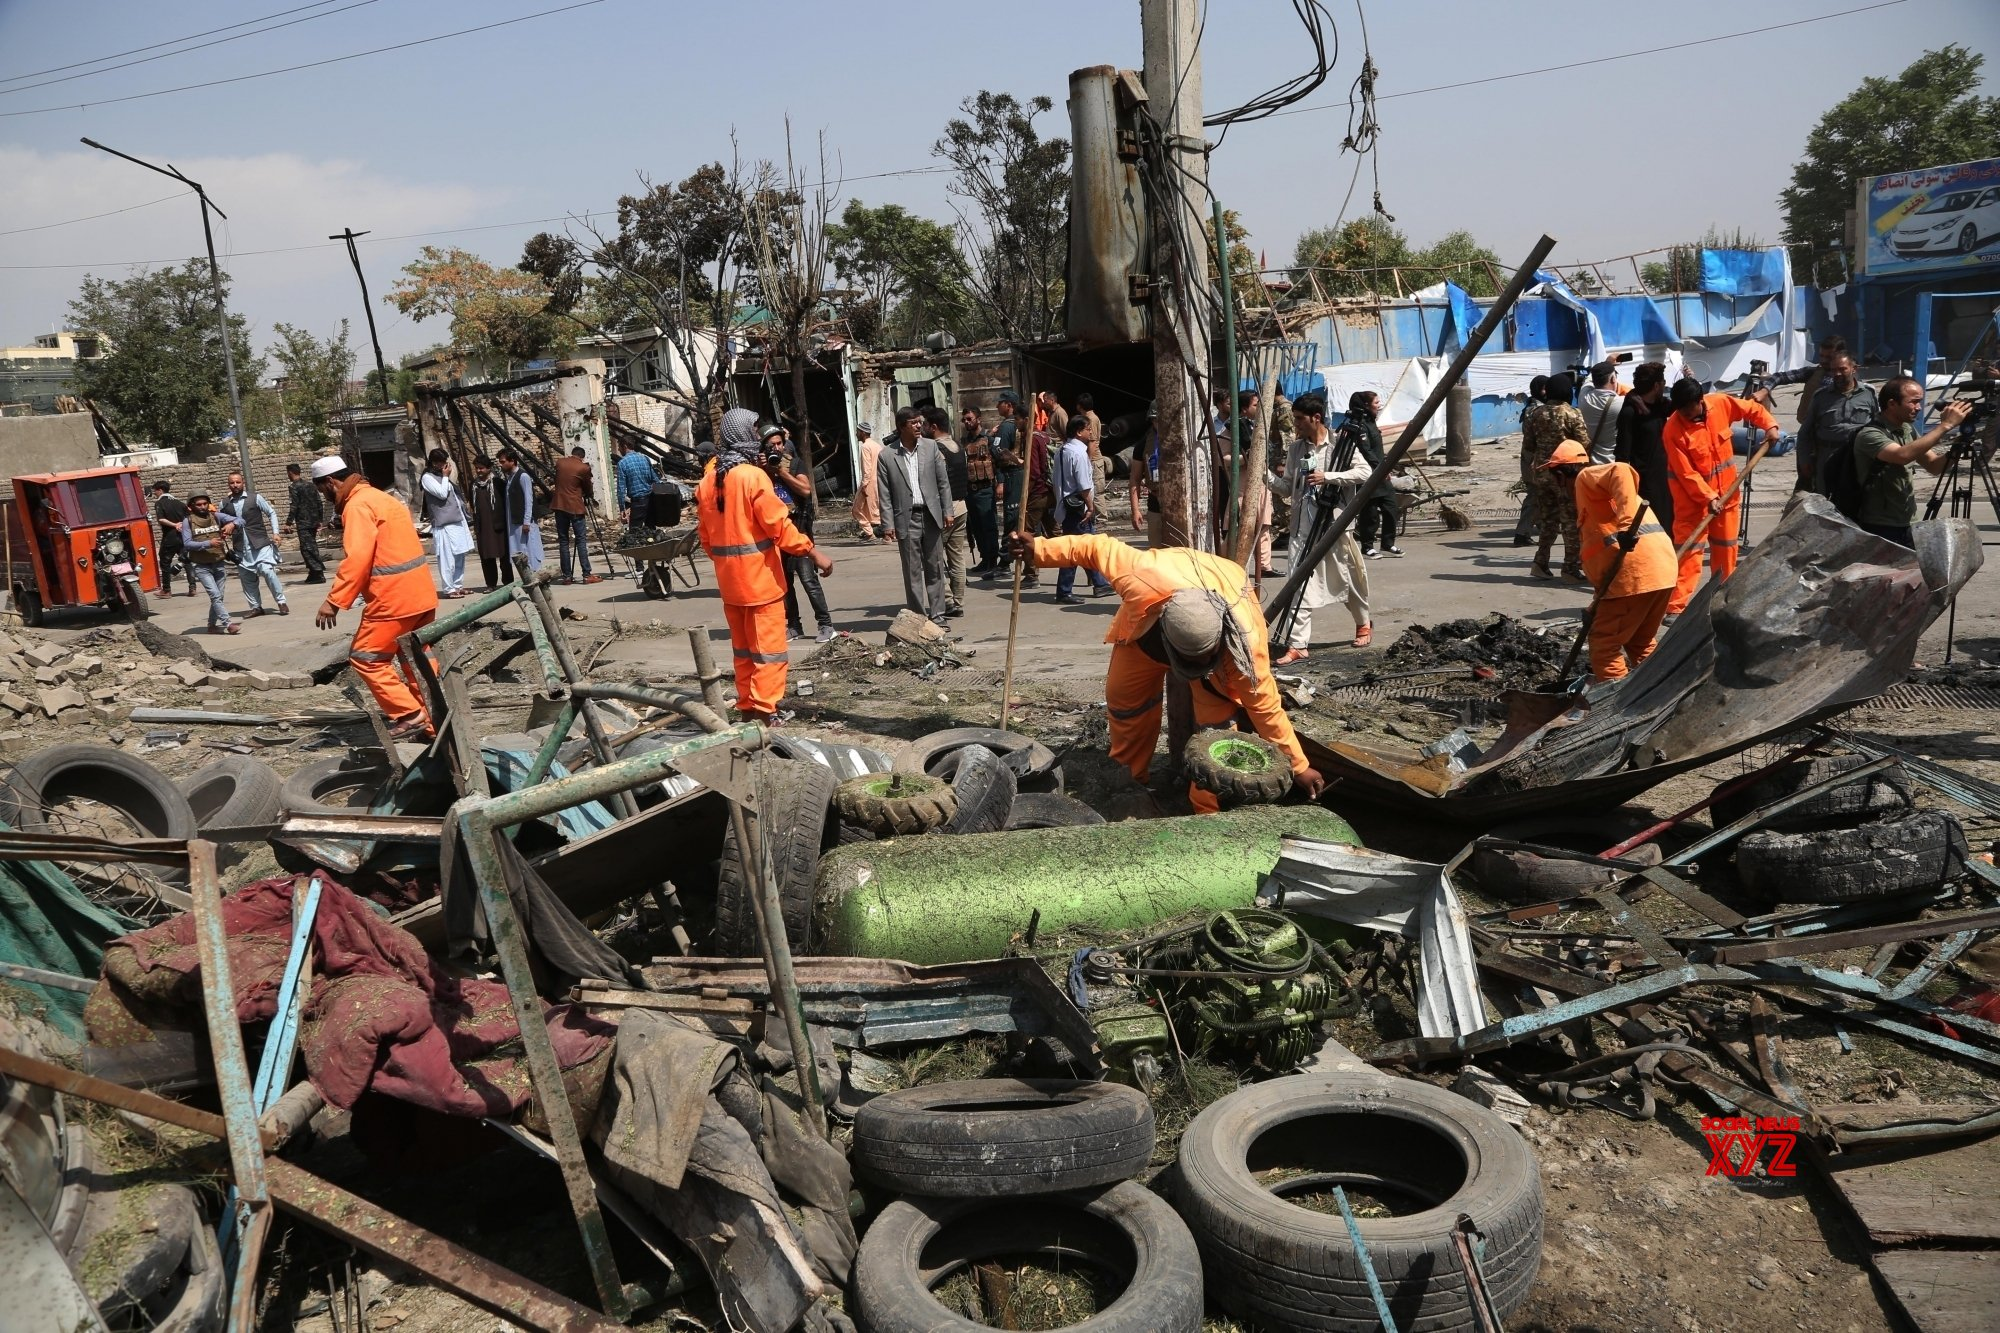 6 dead, over 25 injured in Kabul rocket attacks